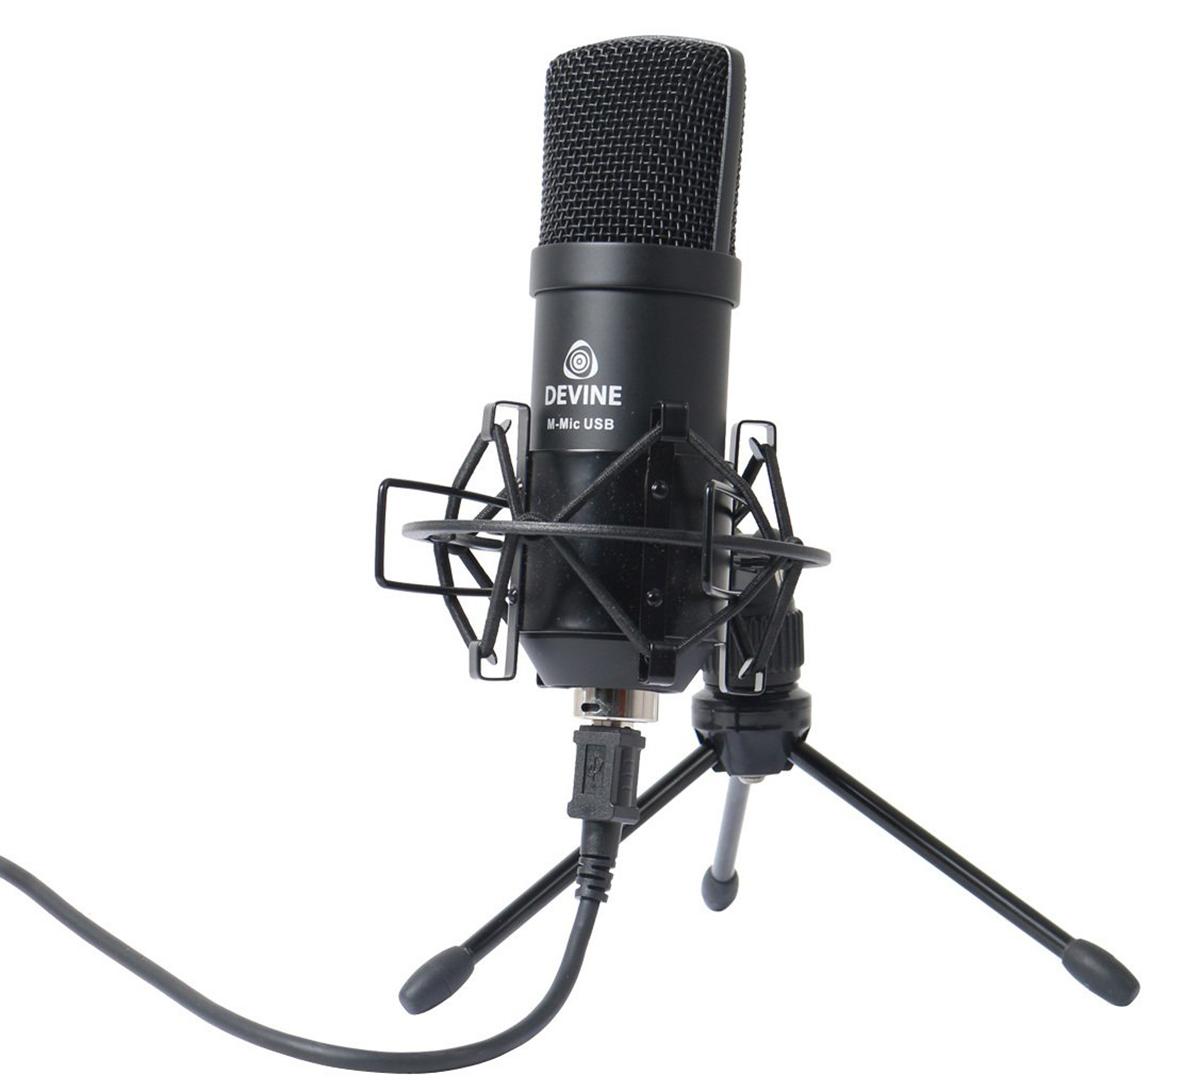 LD Systems PODCAST 2 Studio mikrofonsett USB mikrofoner